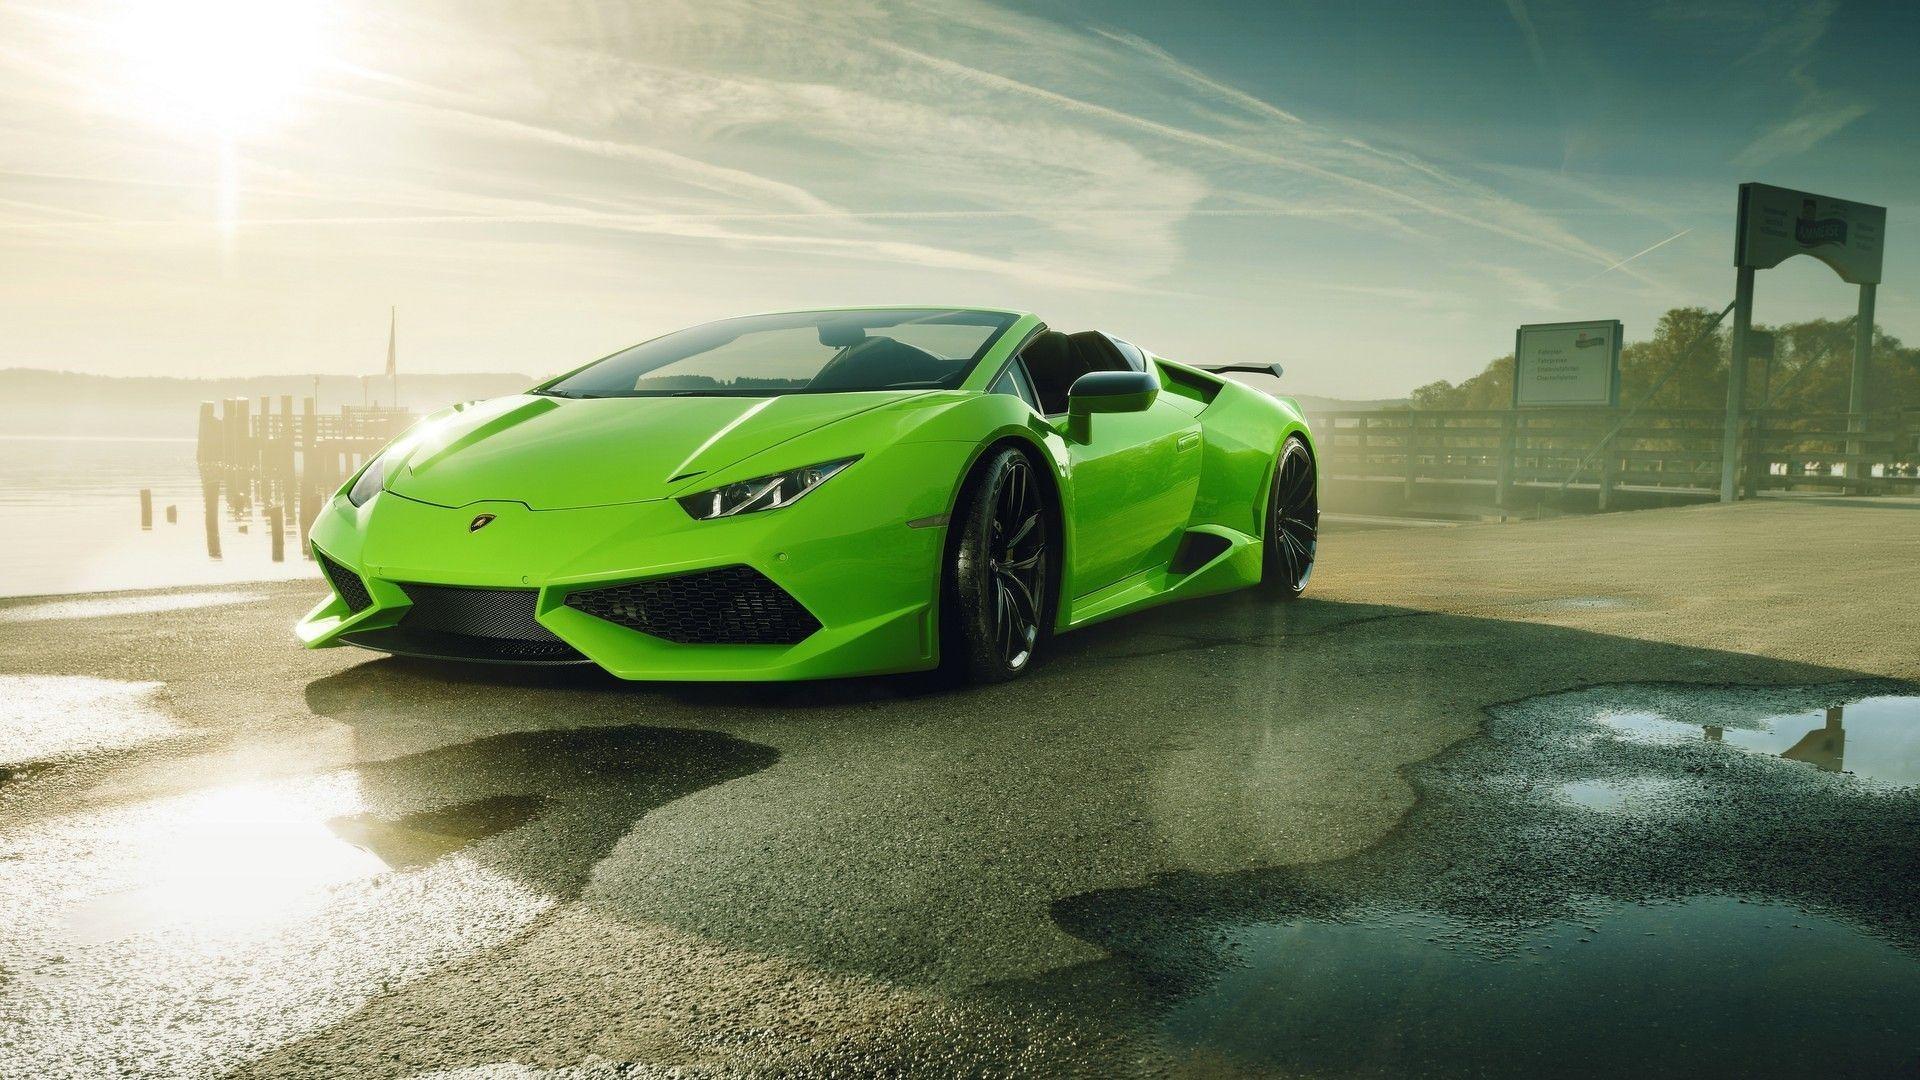 Lamborghini 1920x1080 wallpaper